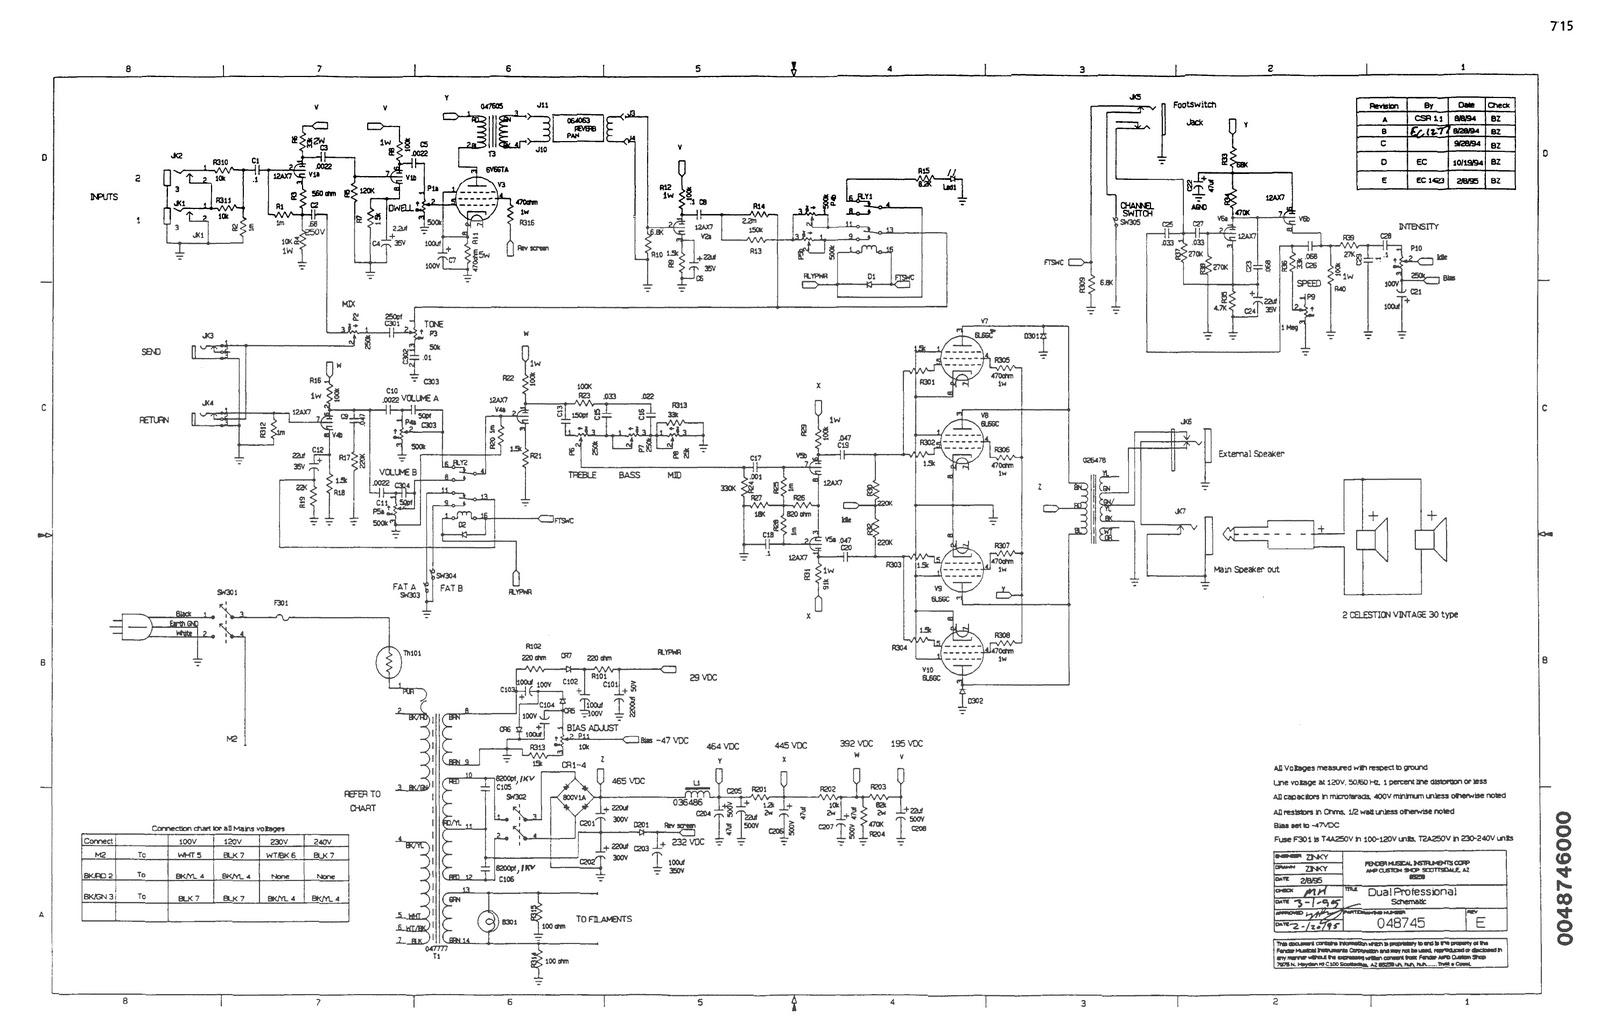 fender hot rod telecaster wiring diagram and explain electron transport vibro king schematic vibrolux ~ elsavadorla